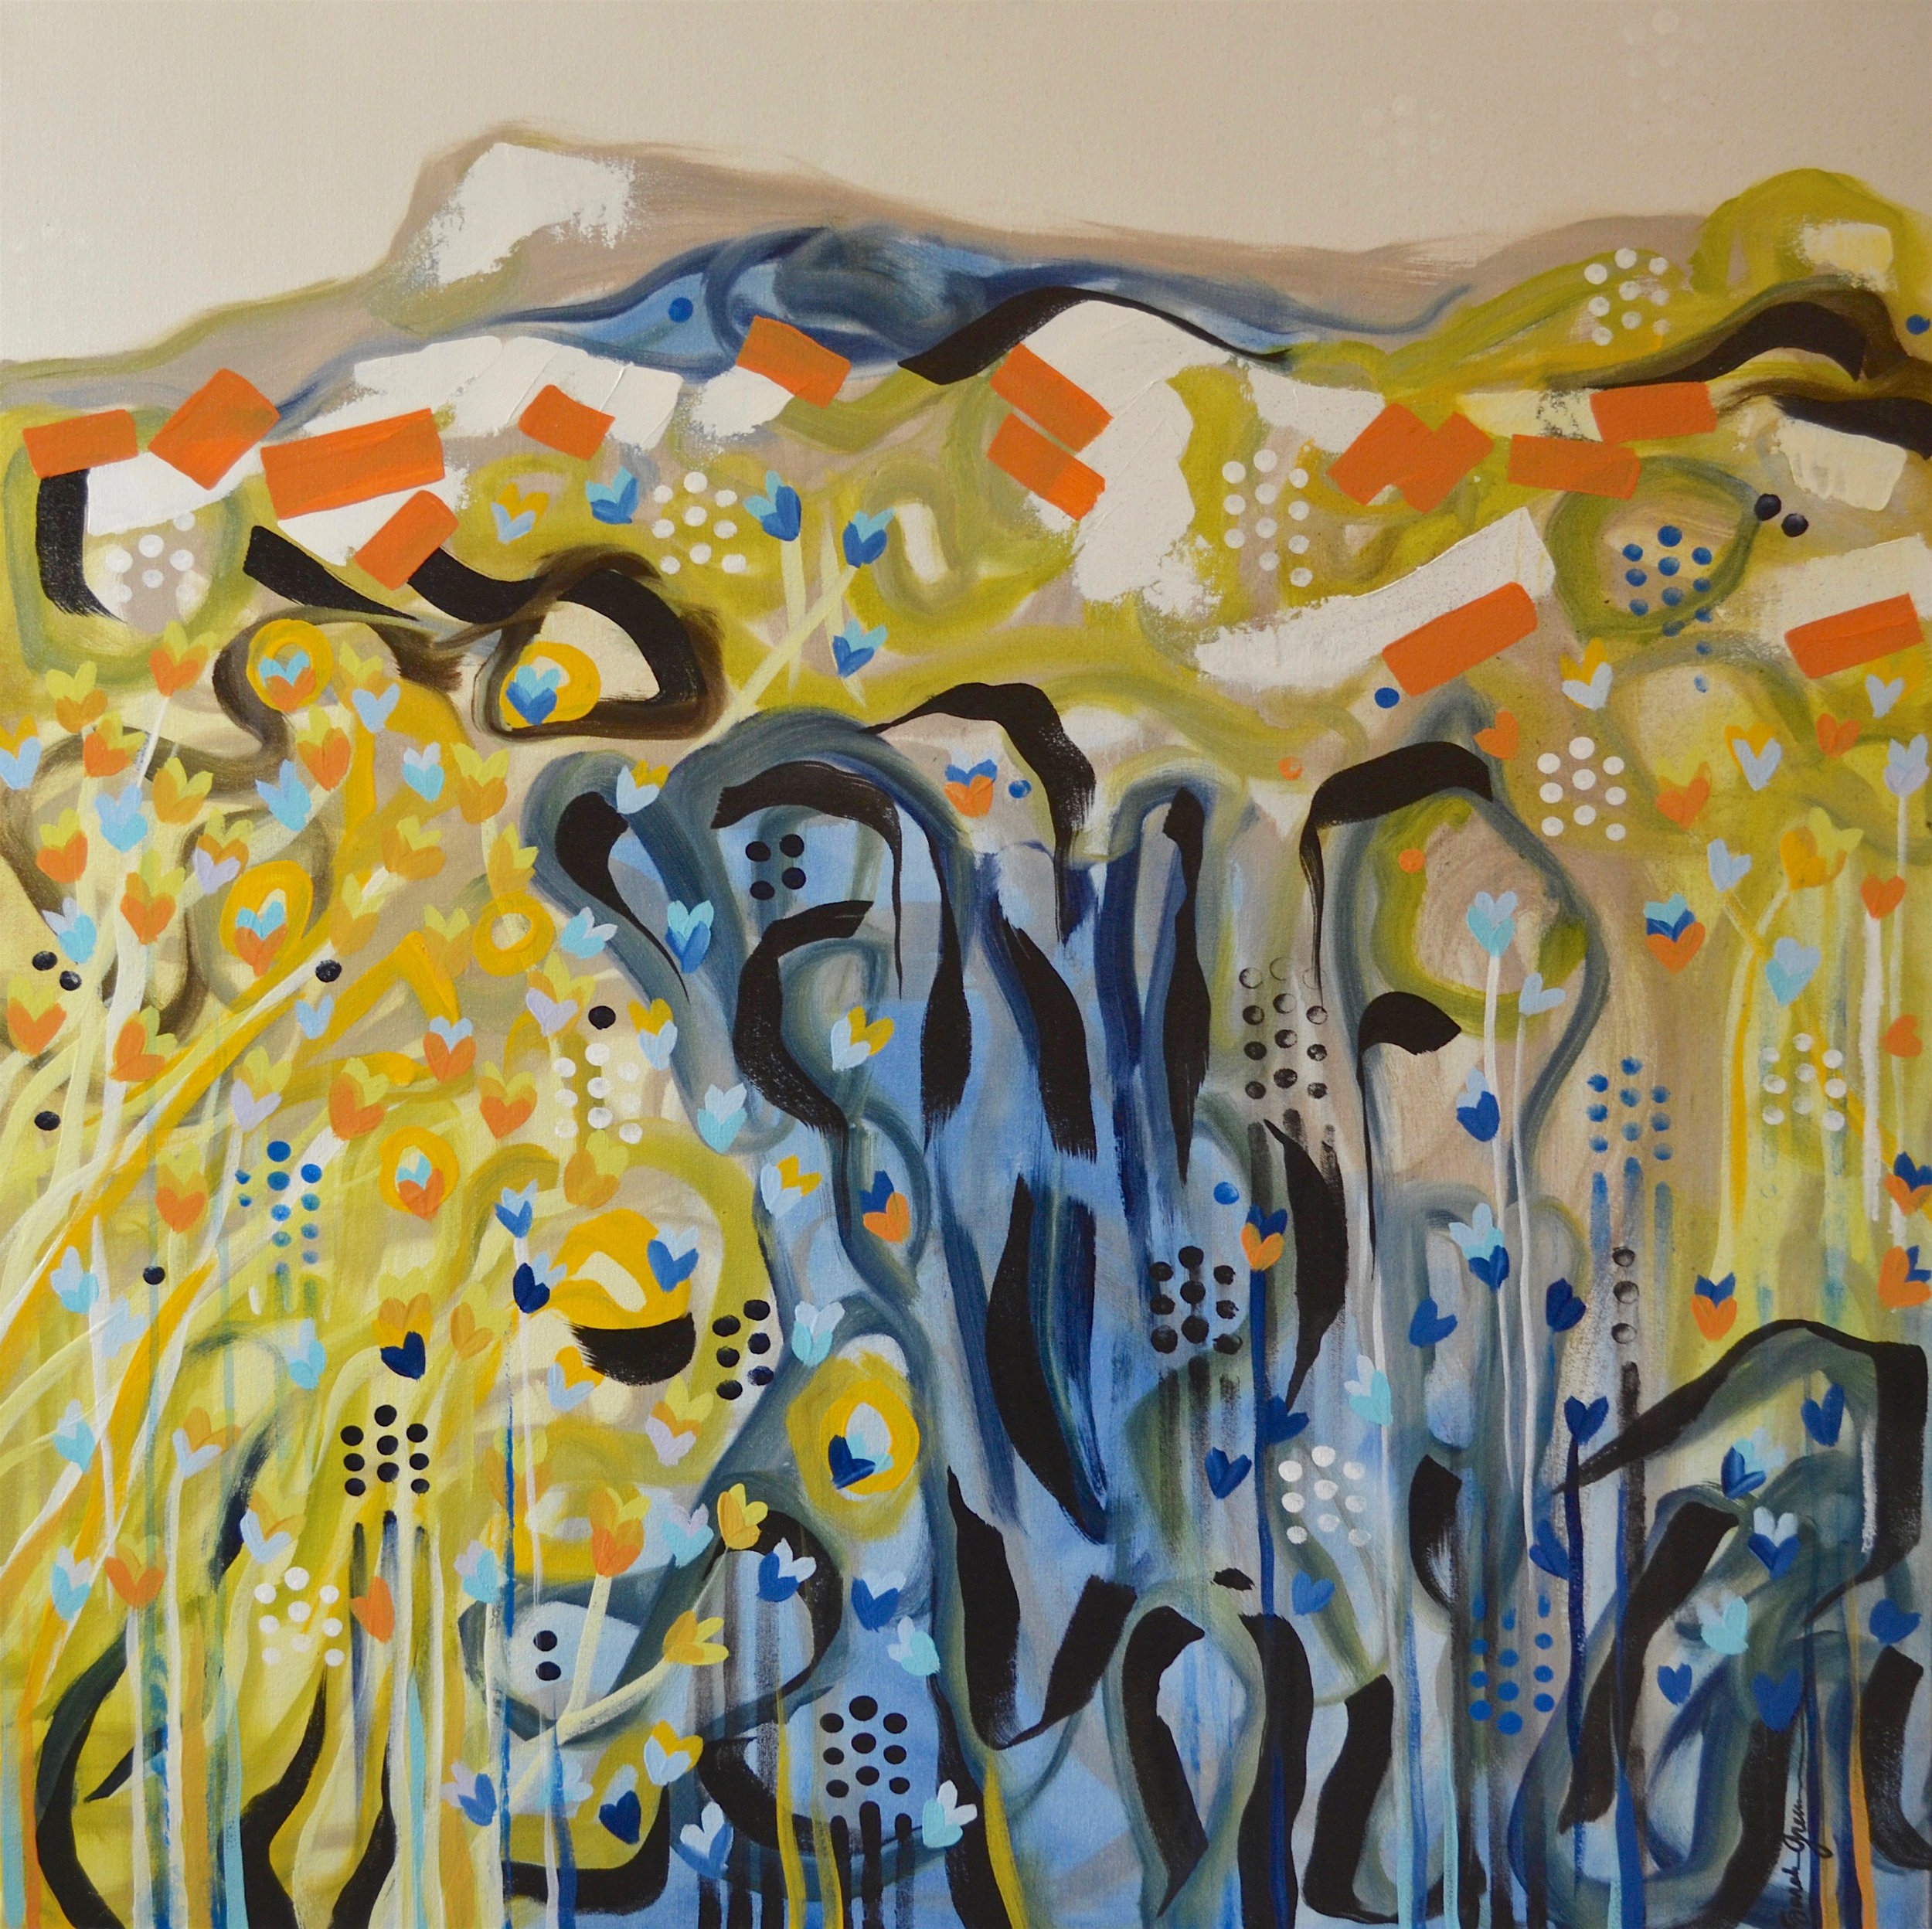 Sun-Steeped  | 36 x 36 inch acrylic on canvas